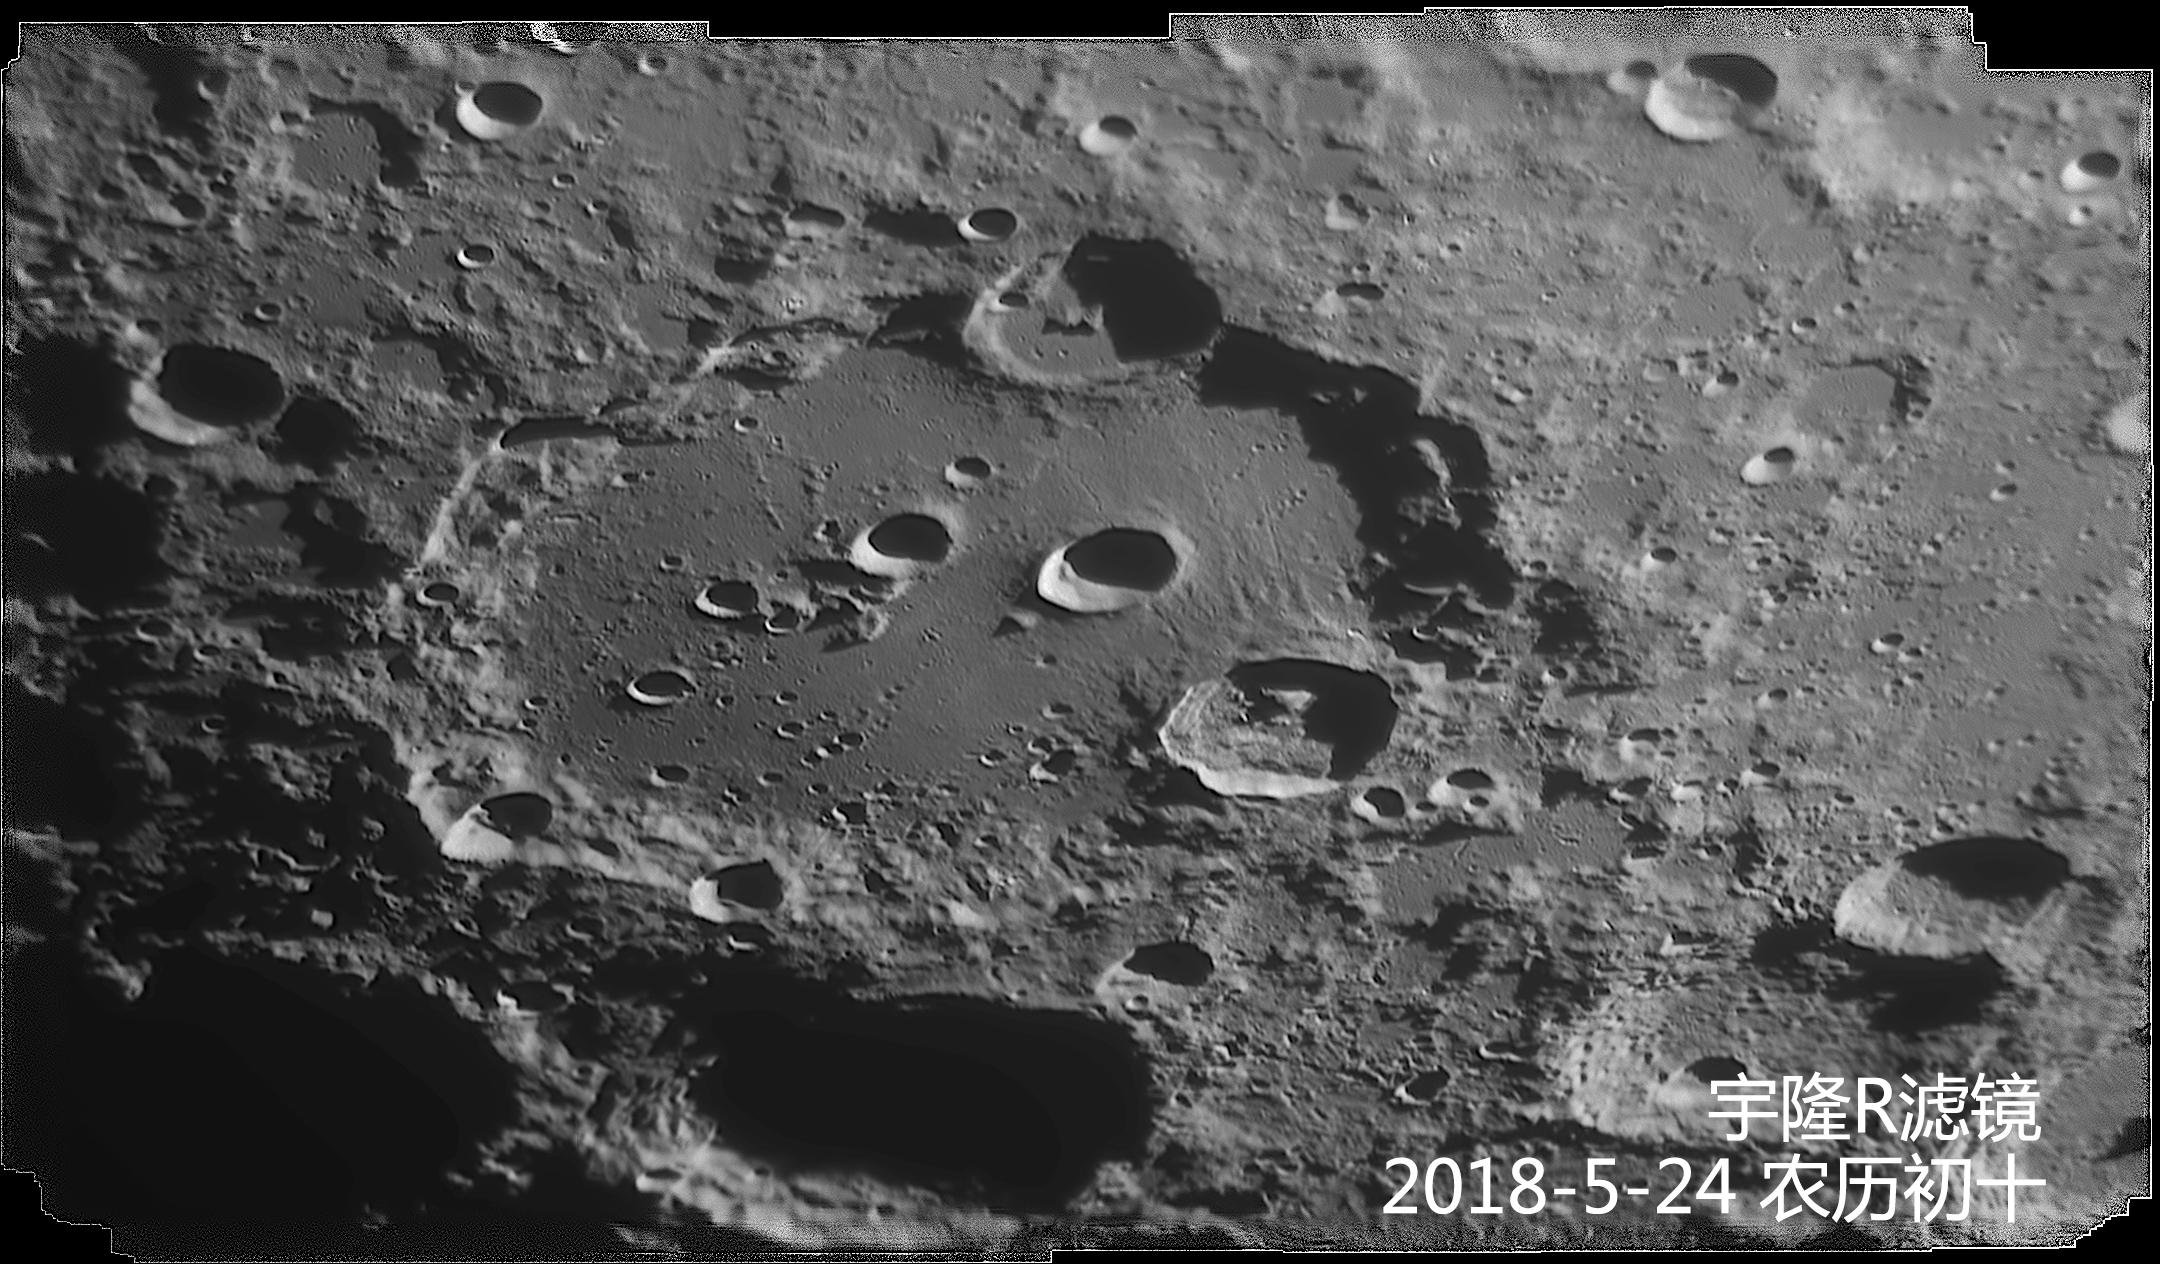 2018-05-24-1424_5_R滤镜.jpg